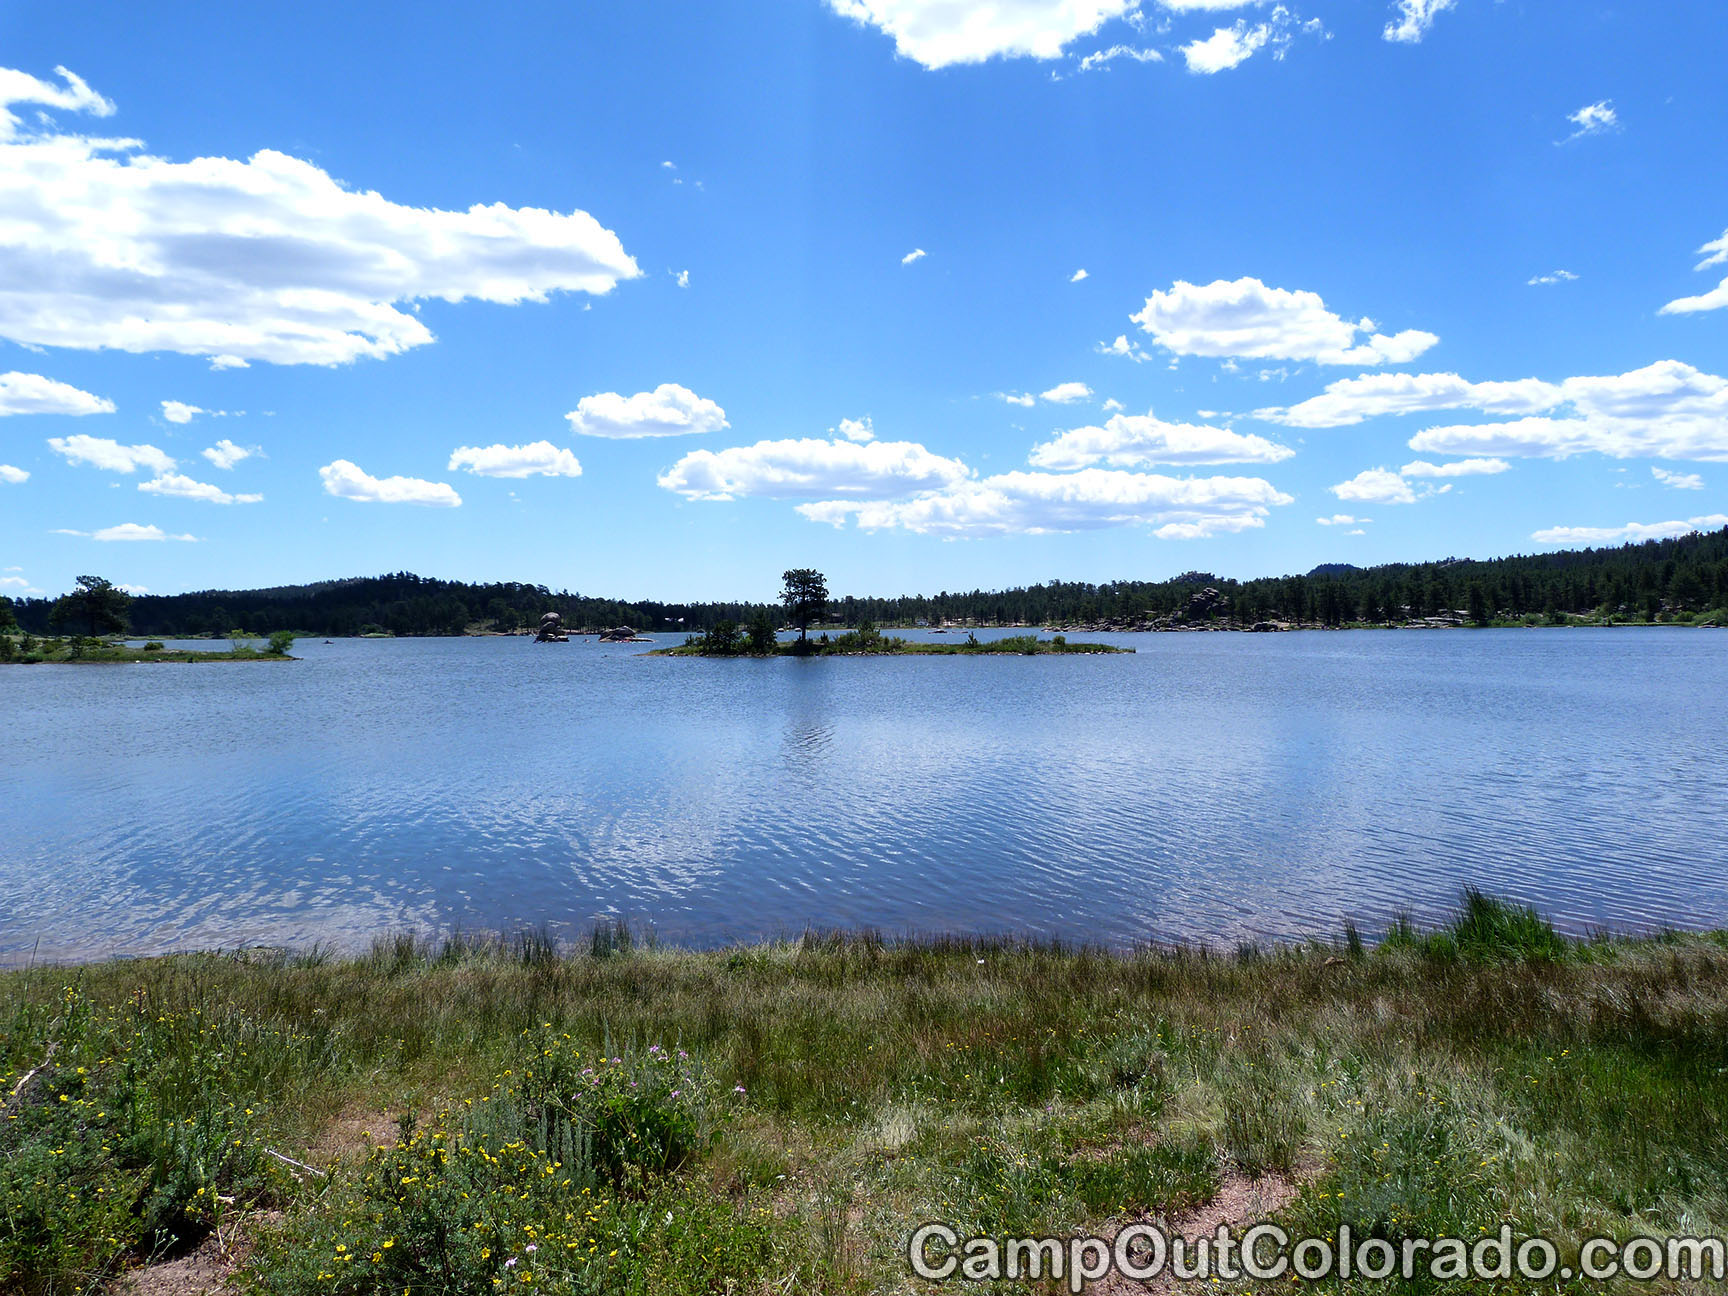 Campoutcolorado-dowdy-lake-campground-islands